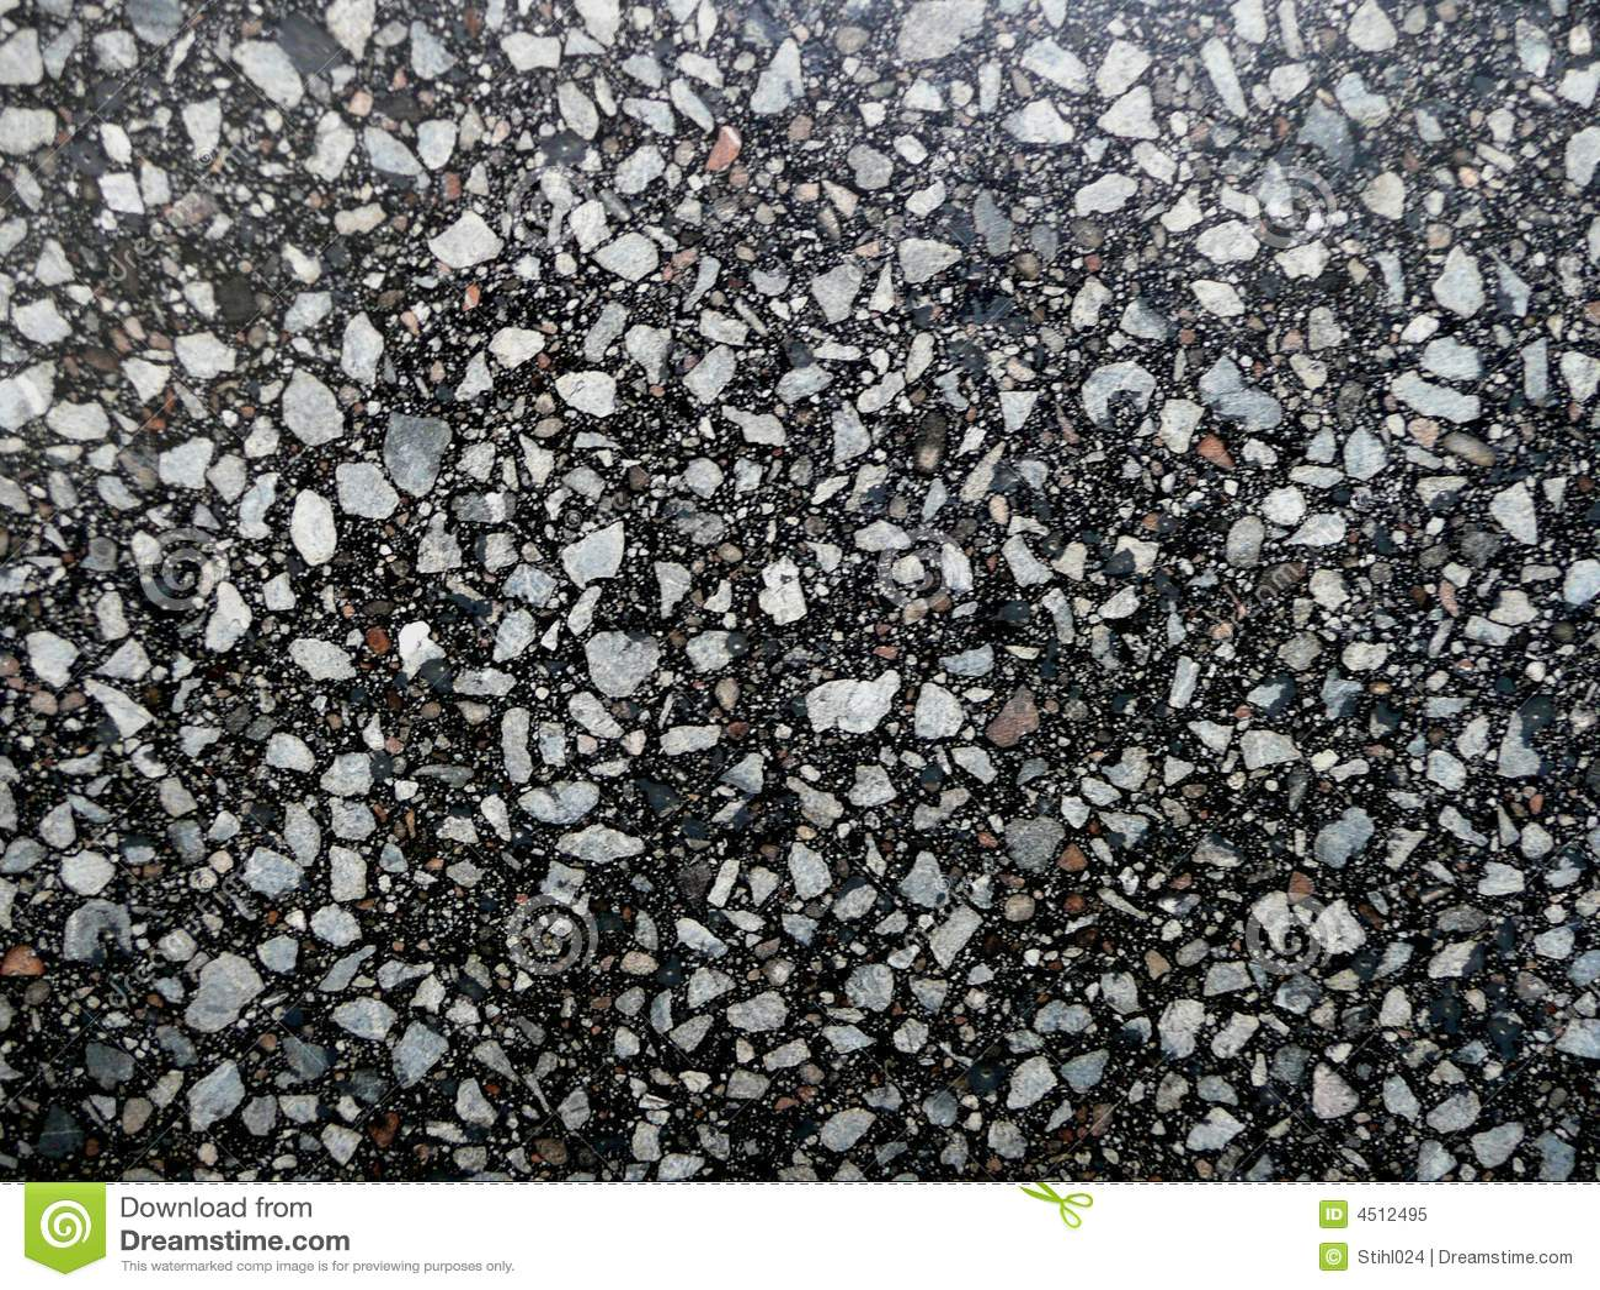 Terrazzo flooring stock image Image of edgy ground